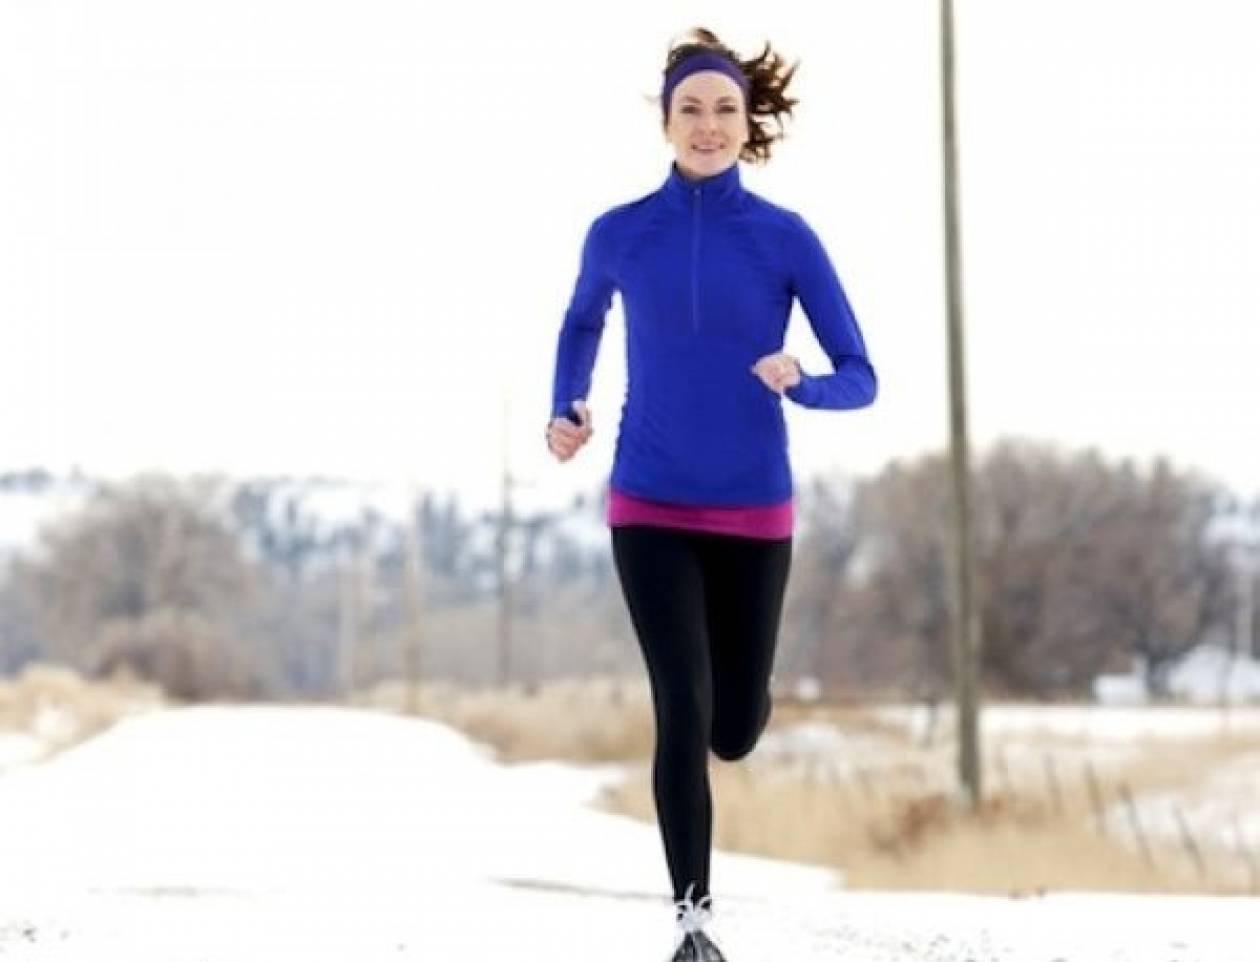 Oι 5 πιο συμβουλές για να τρέχετε με ασφάλεια μέσα στον χειμώνα